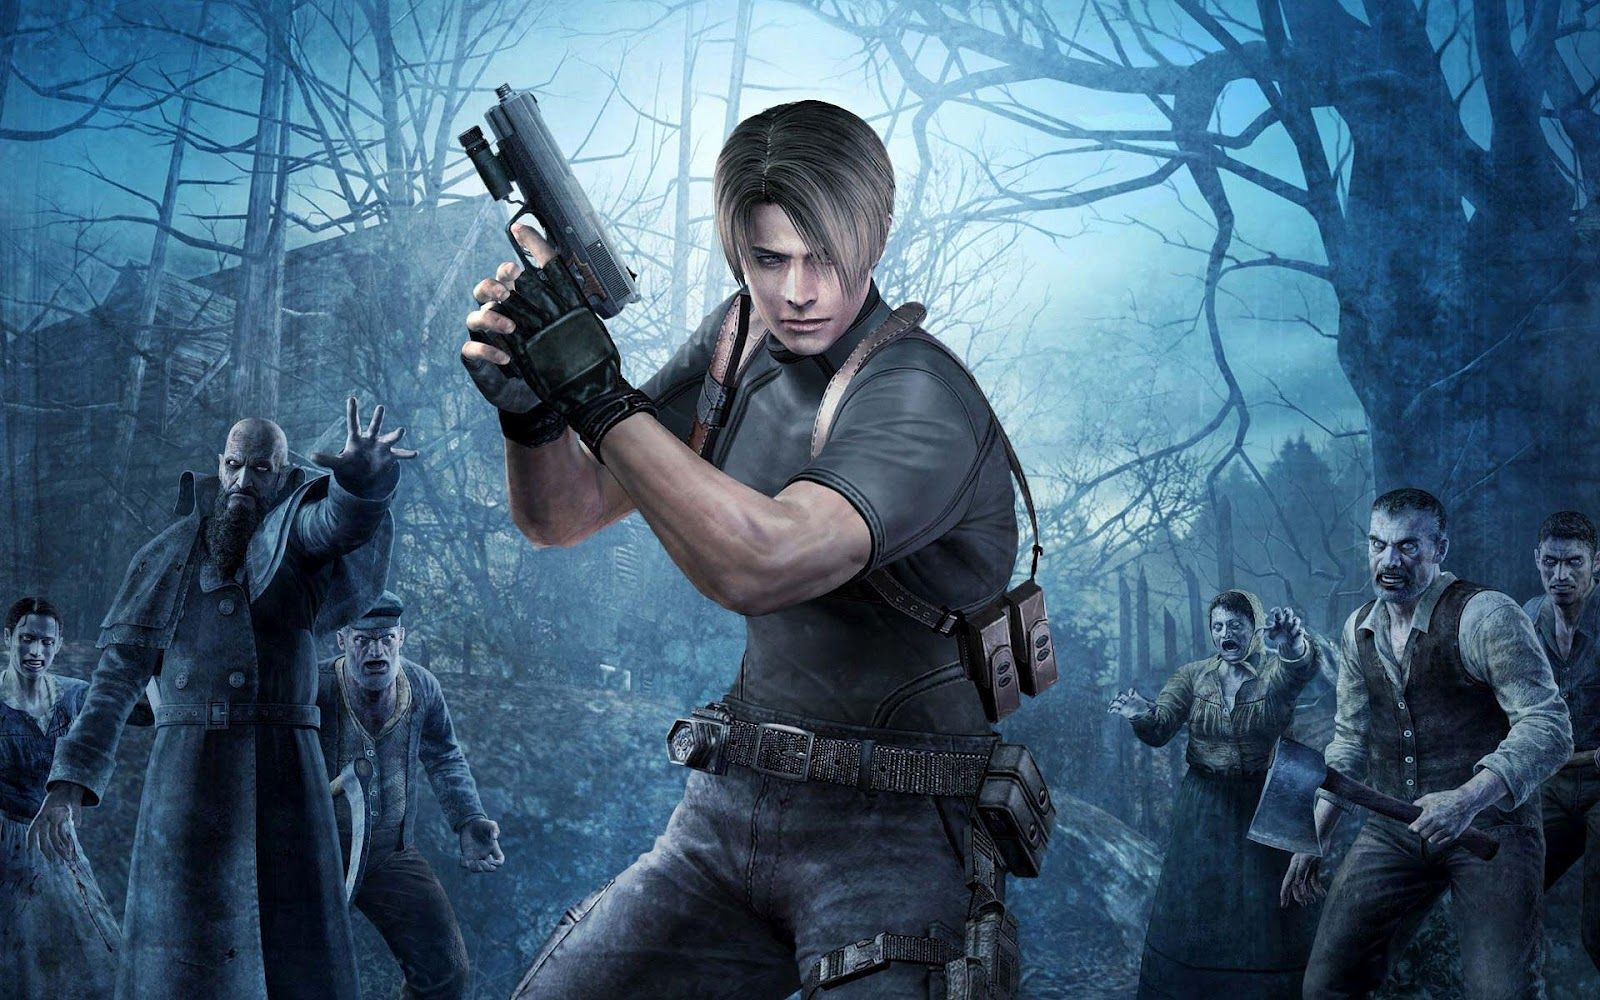 Resident Evil Resident Evil 0 And Resident Evil 4 Creep Onto The Switch Https Www Ihorror Com Reside Resident Evil Movie Resident Evil Game Resident Evil